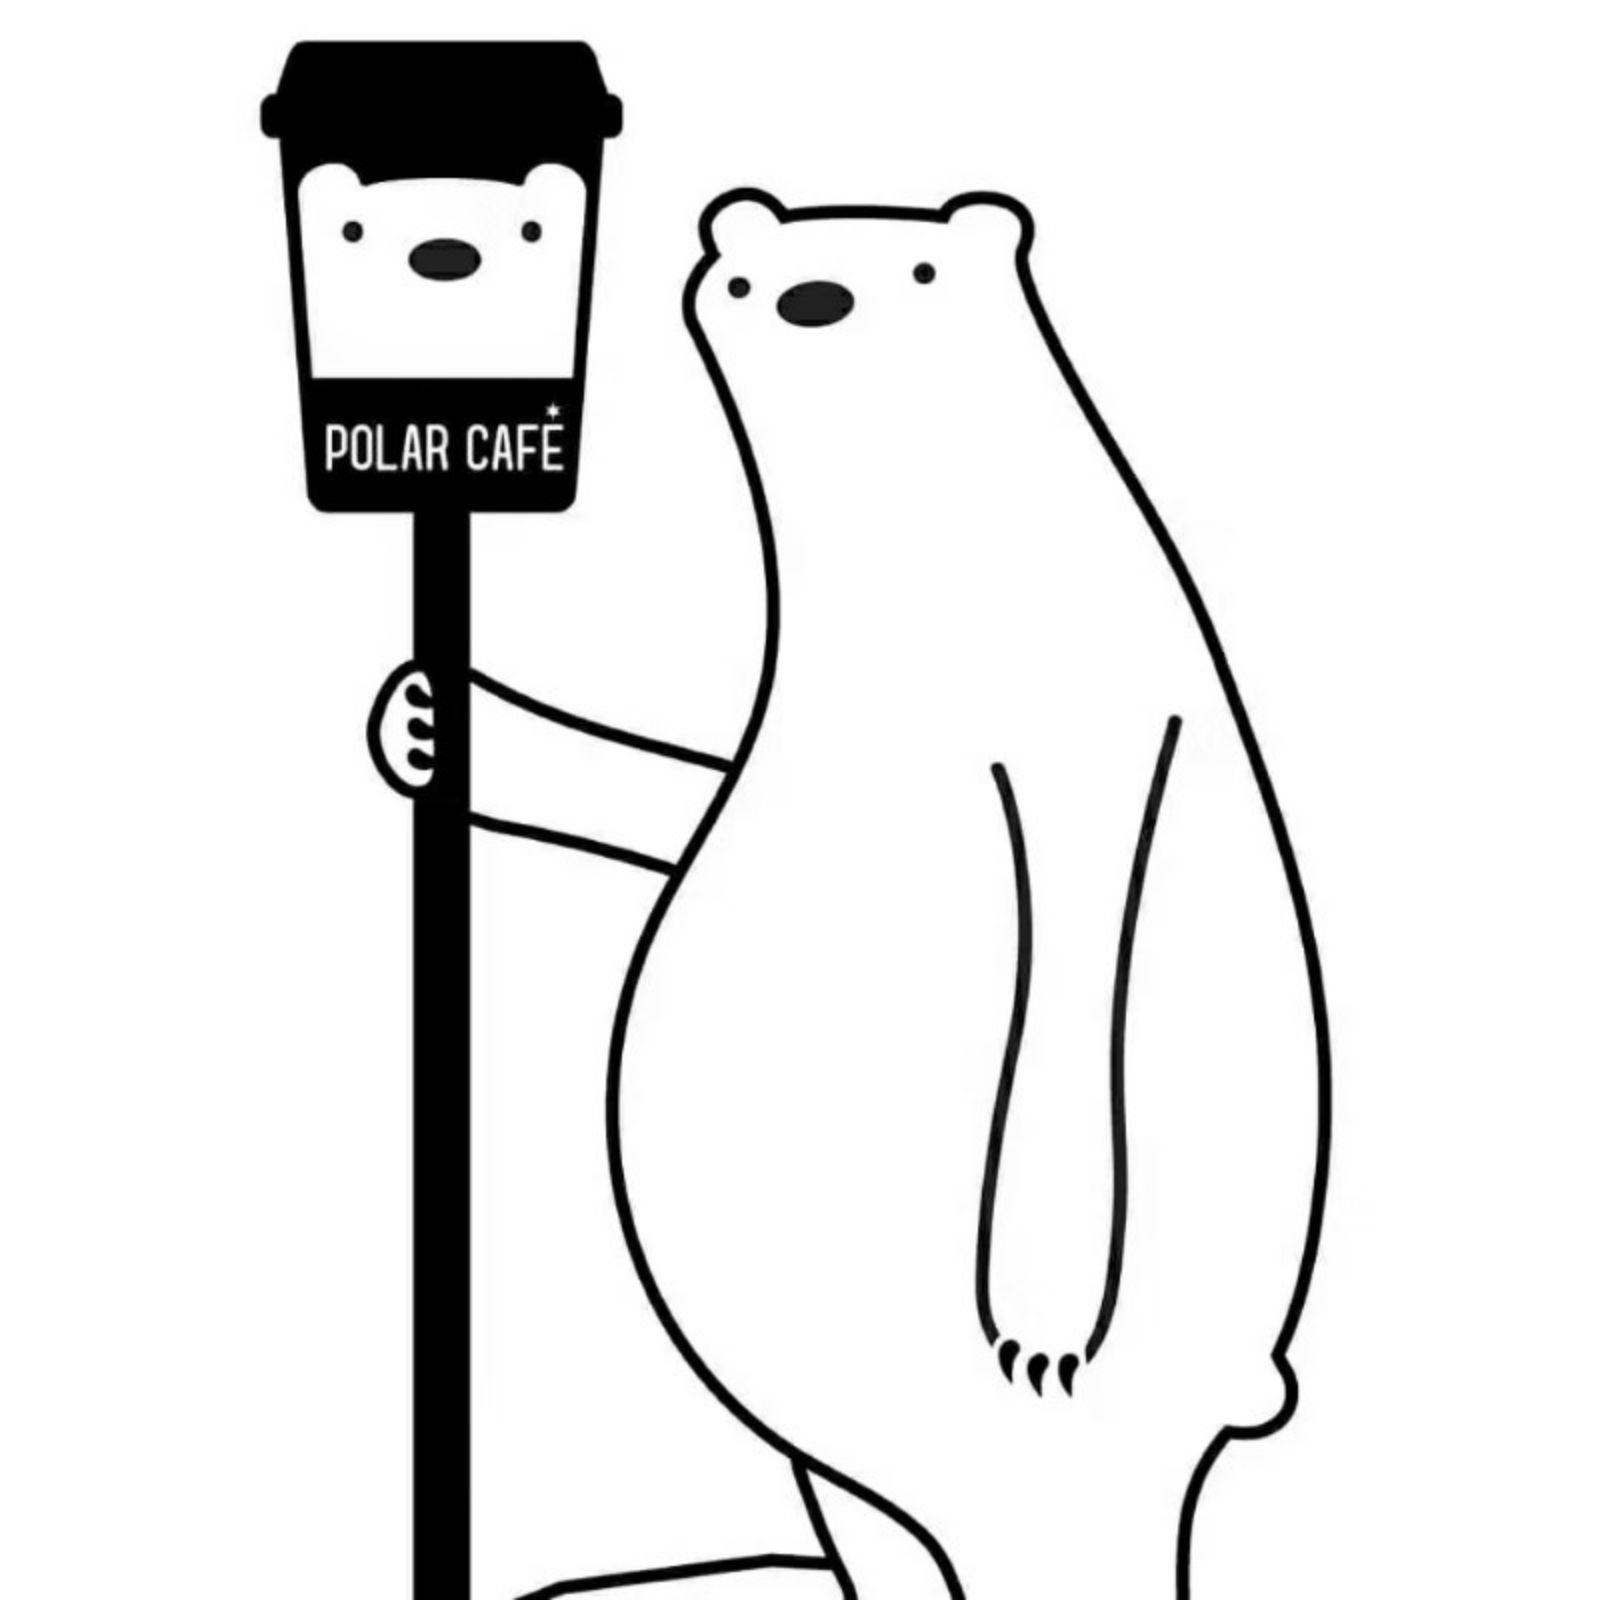 polar cafe